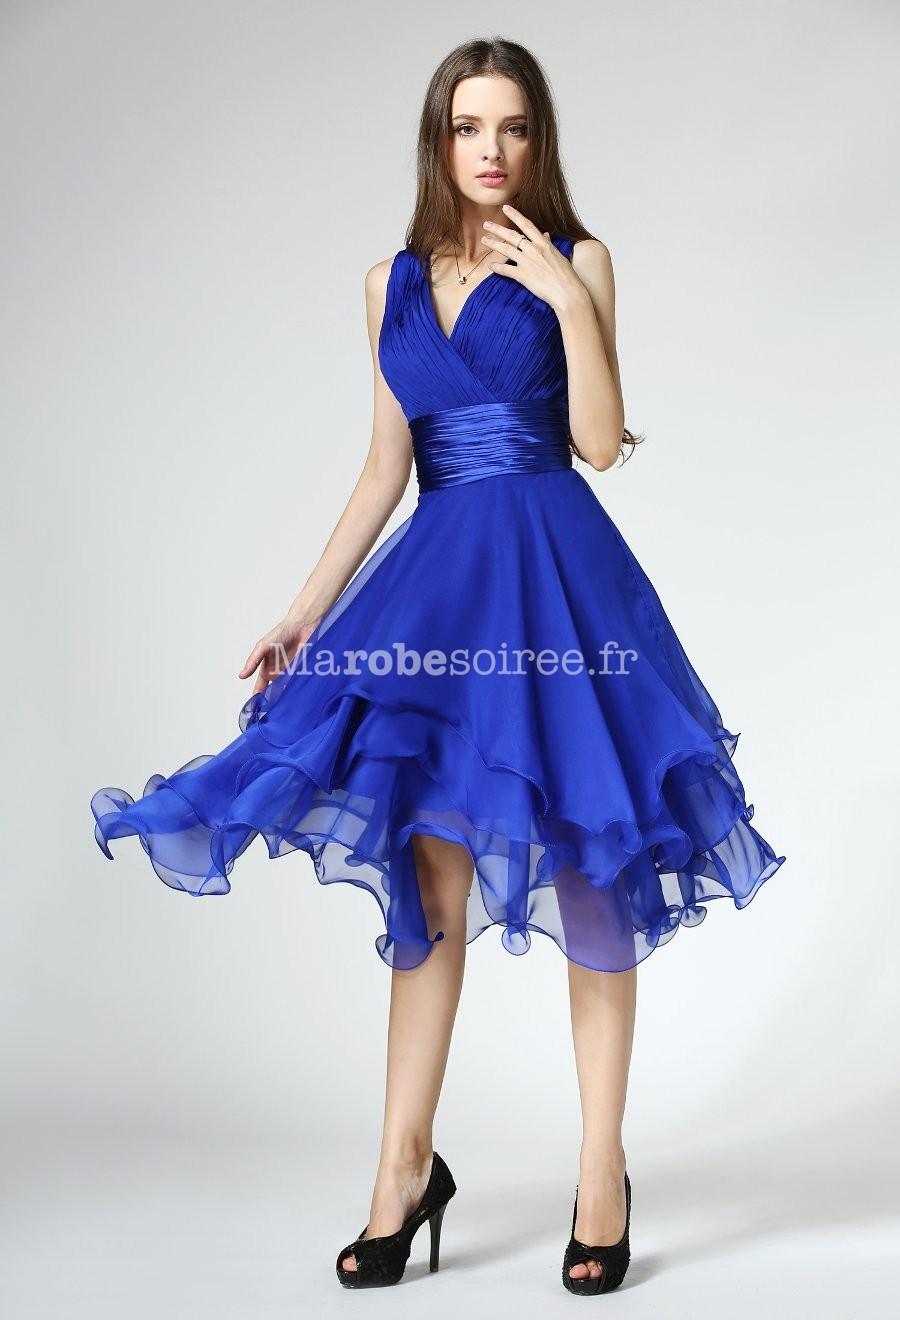 Robe bleu ciel courte fashion designs for Robe bleue pour mariage